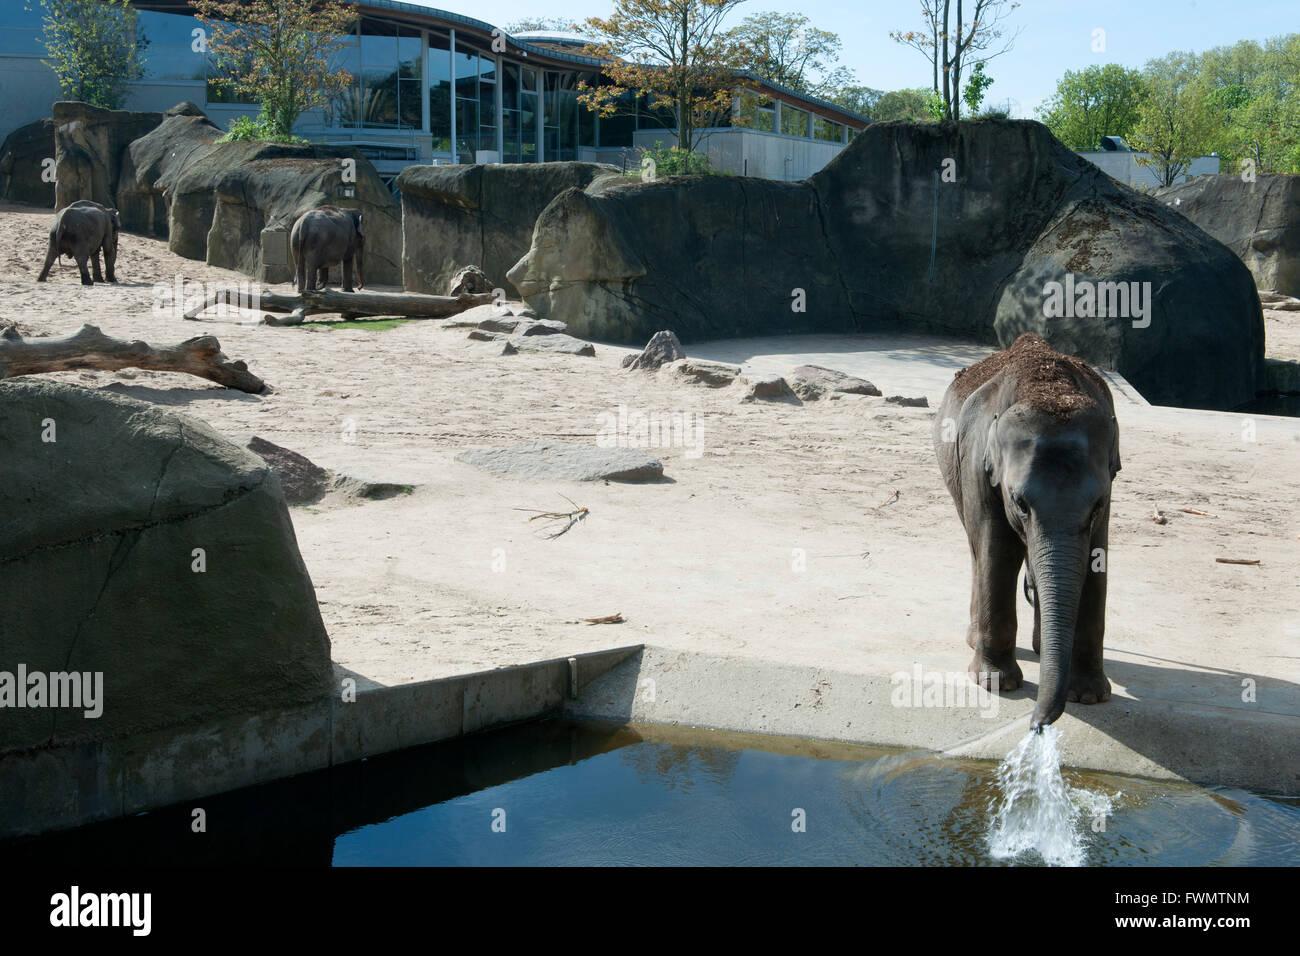 Köln, Riehl, ne Besuch em Zoo, Elefantengehege - Stock Image